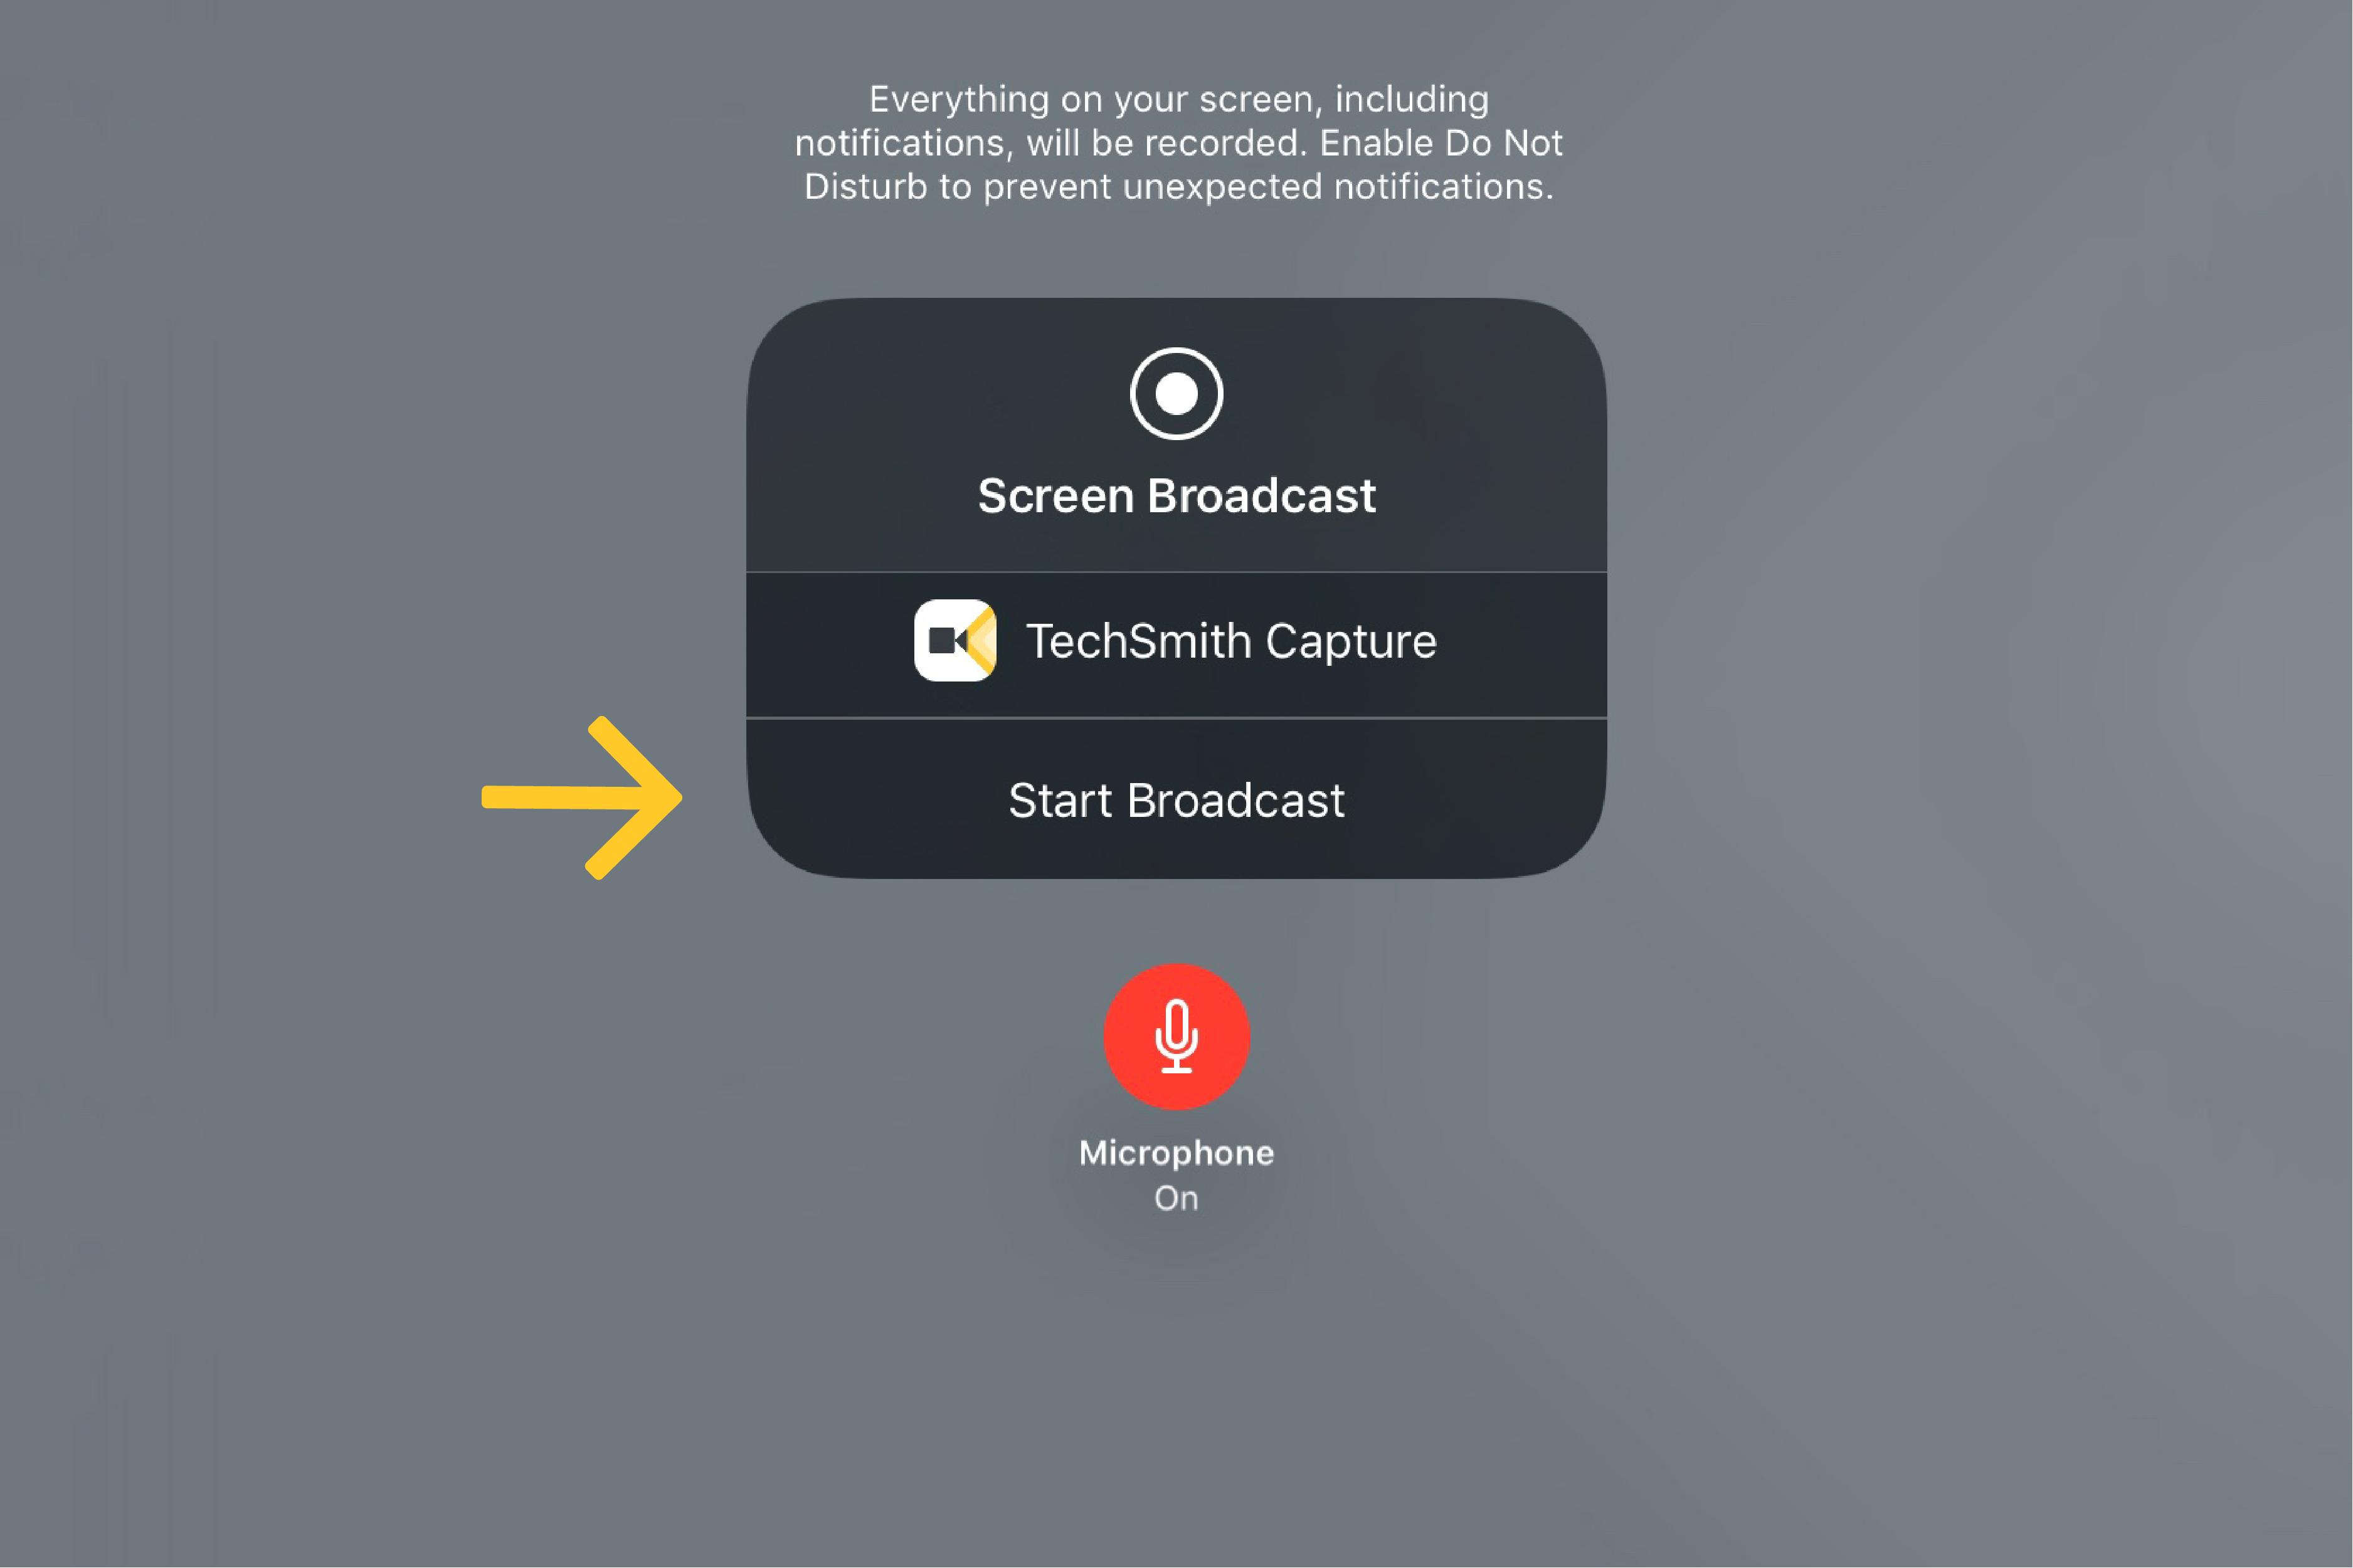 TechSmith Capture Screen Broadcast button